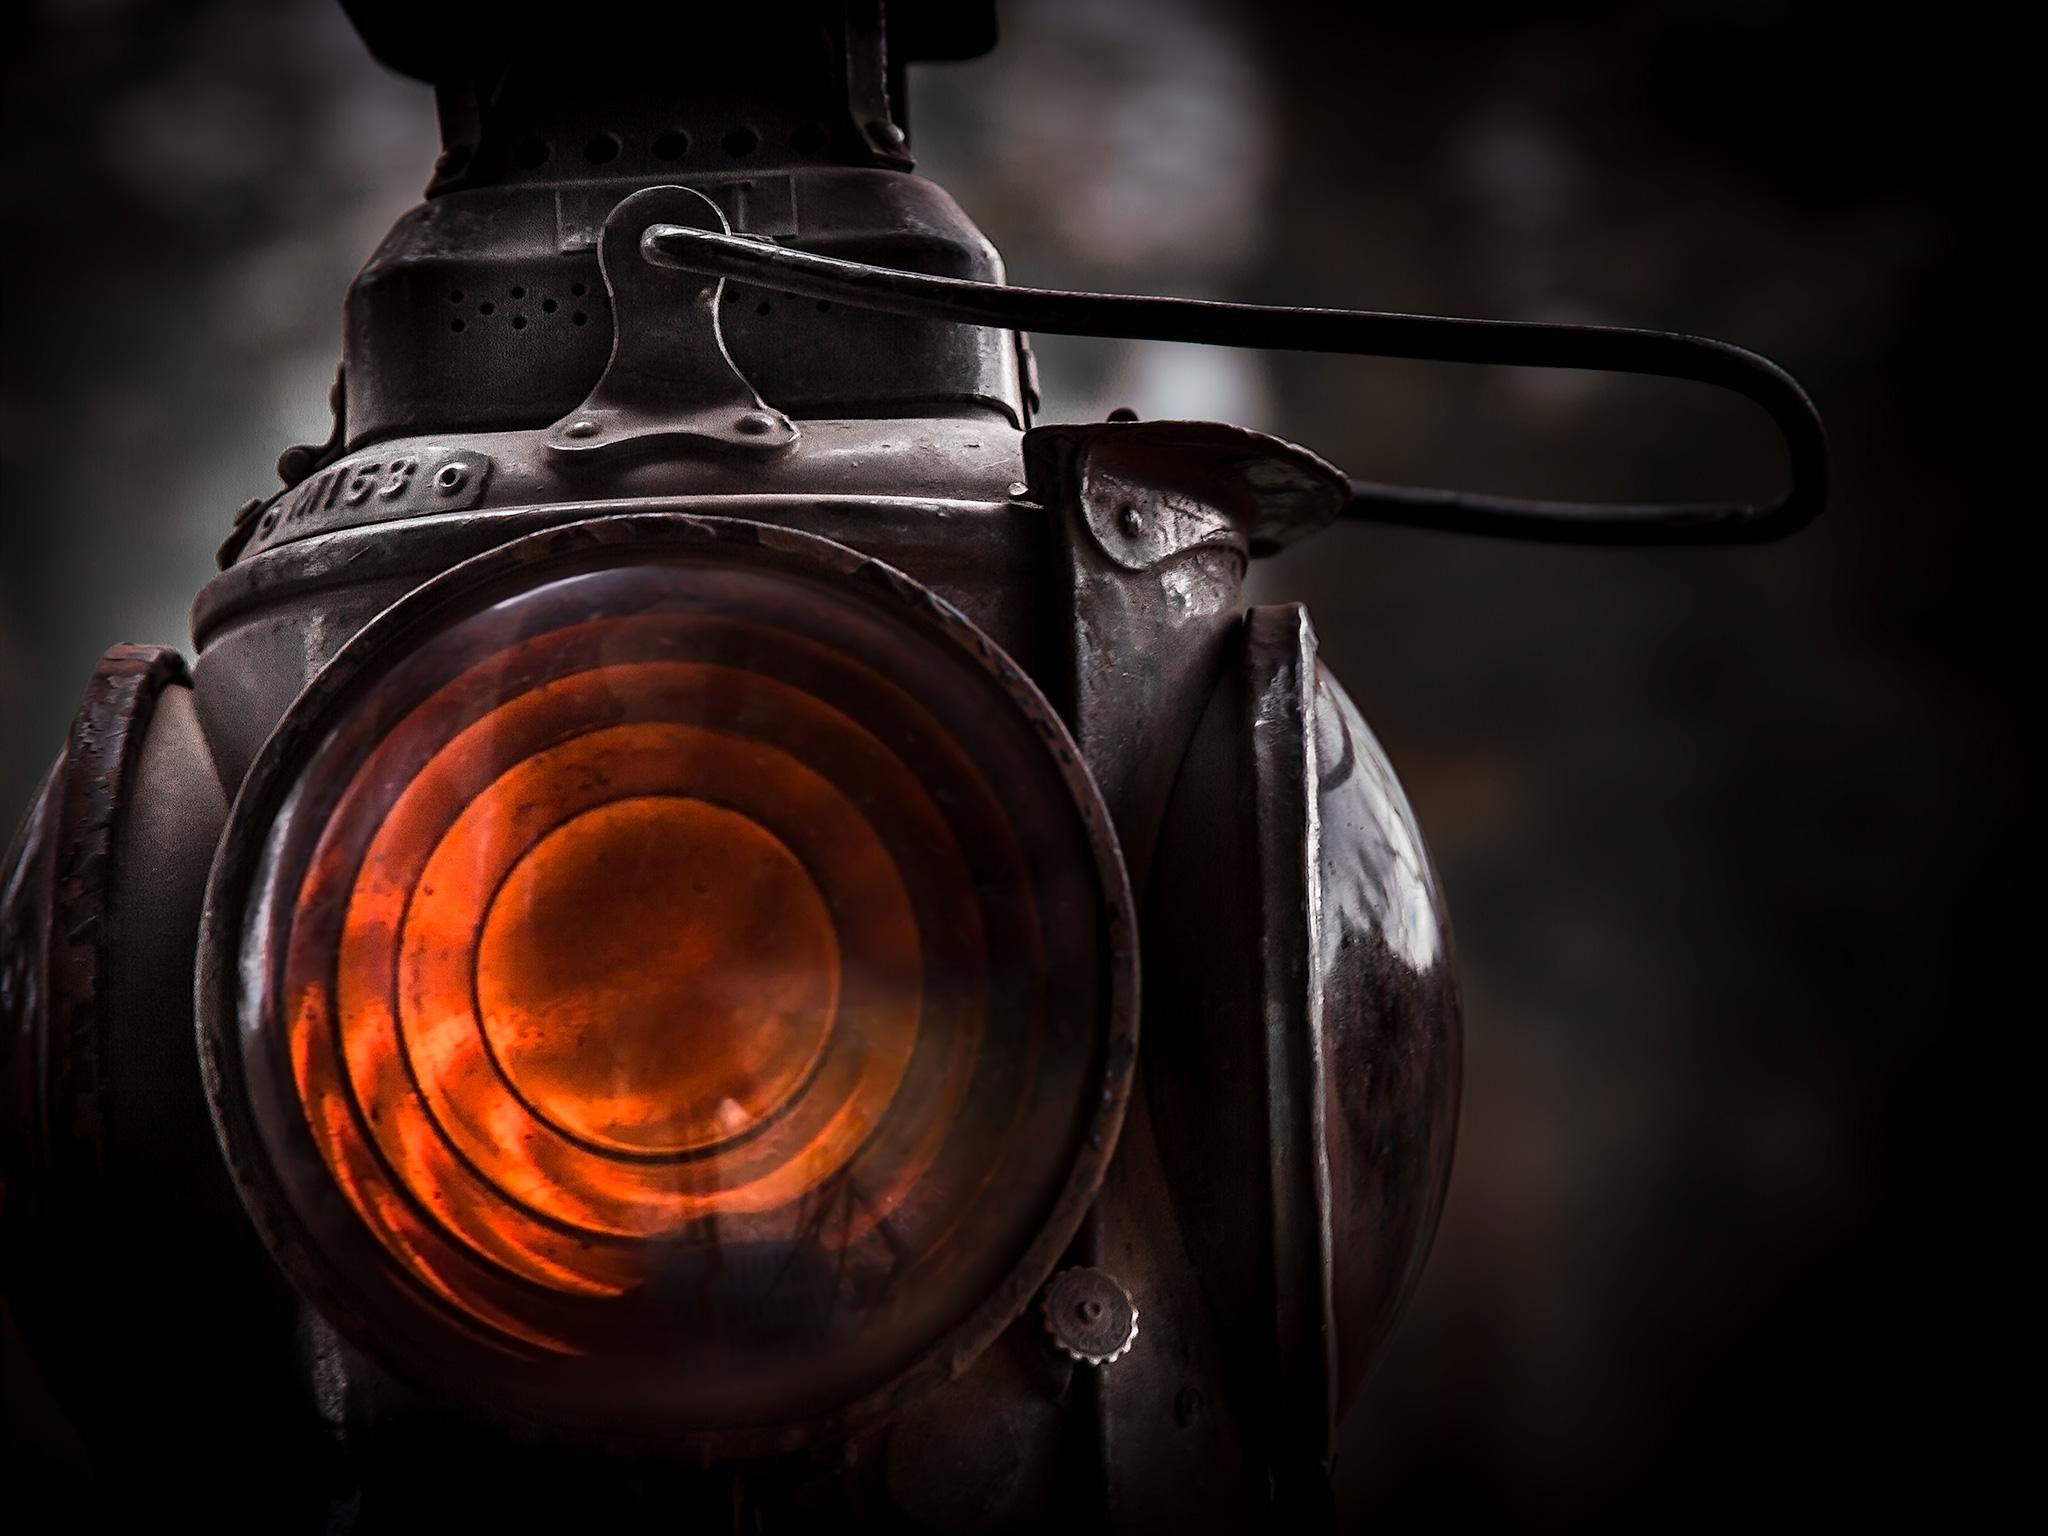 carriagelamp